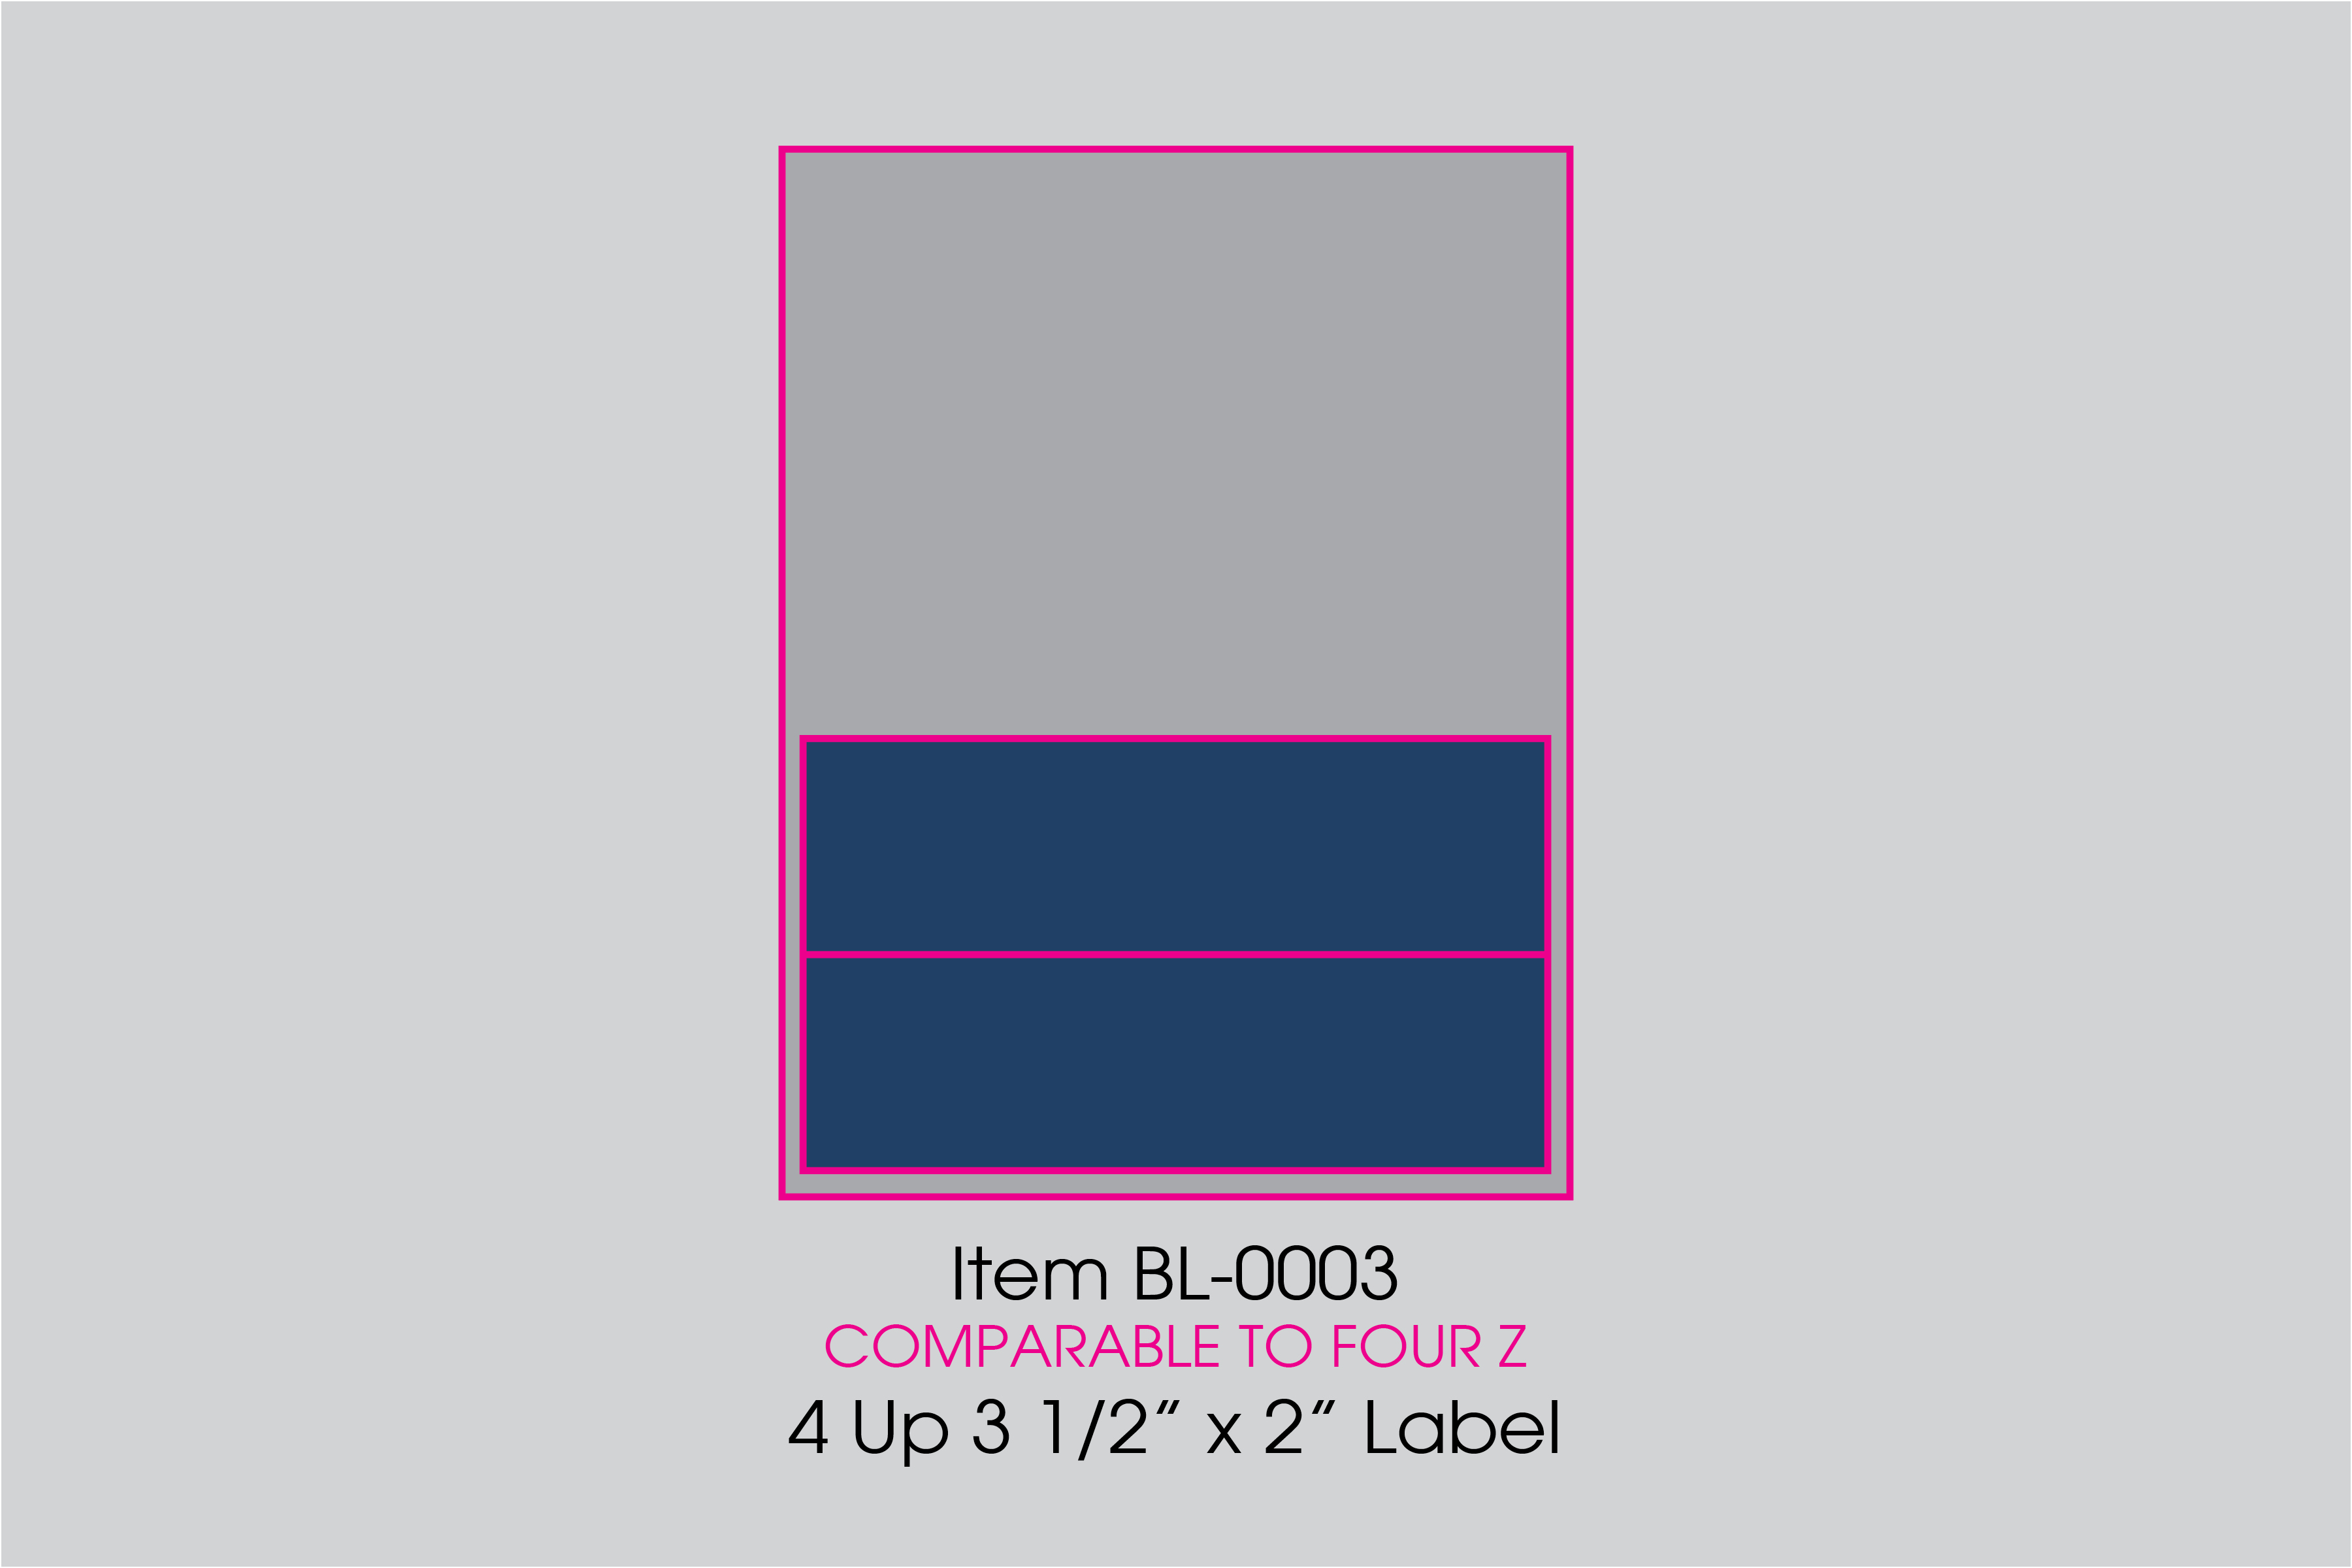 BL-0003